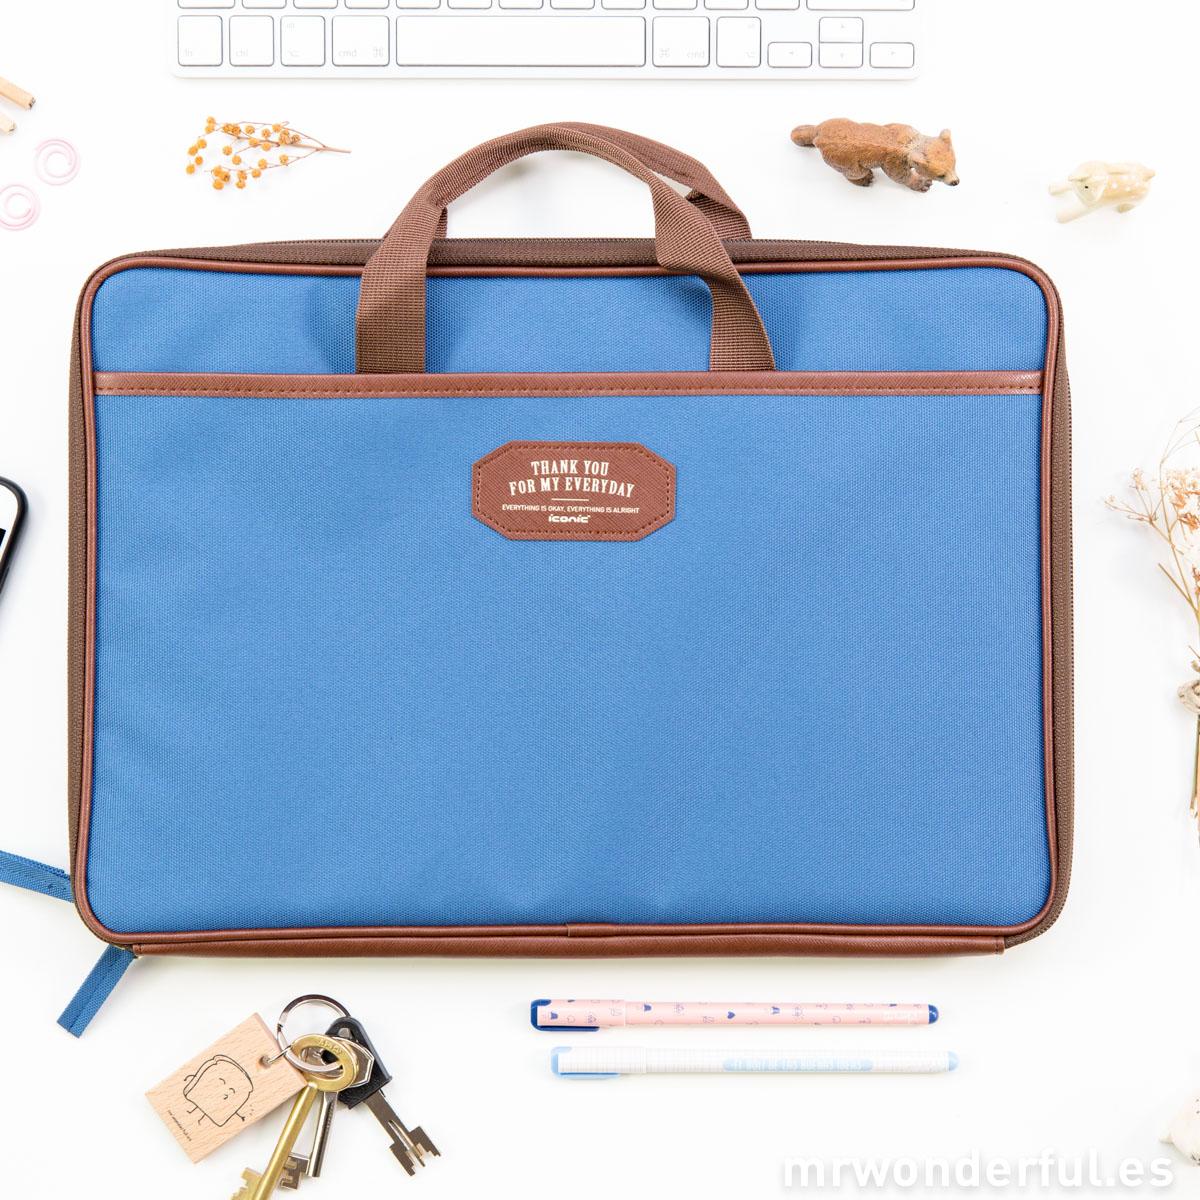 mrwonderful_ 8809180694861-ICONIC0206A-Funda-Iconic-con-asas-para-ordenador-portatil-documentos–Azul-5